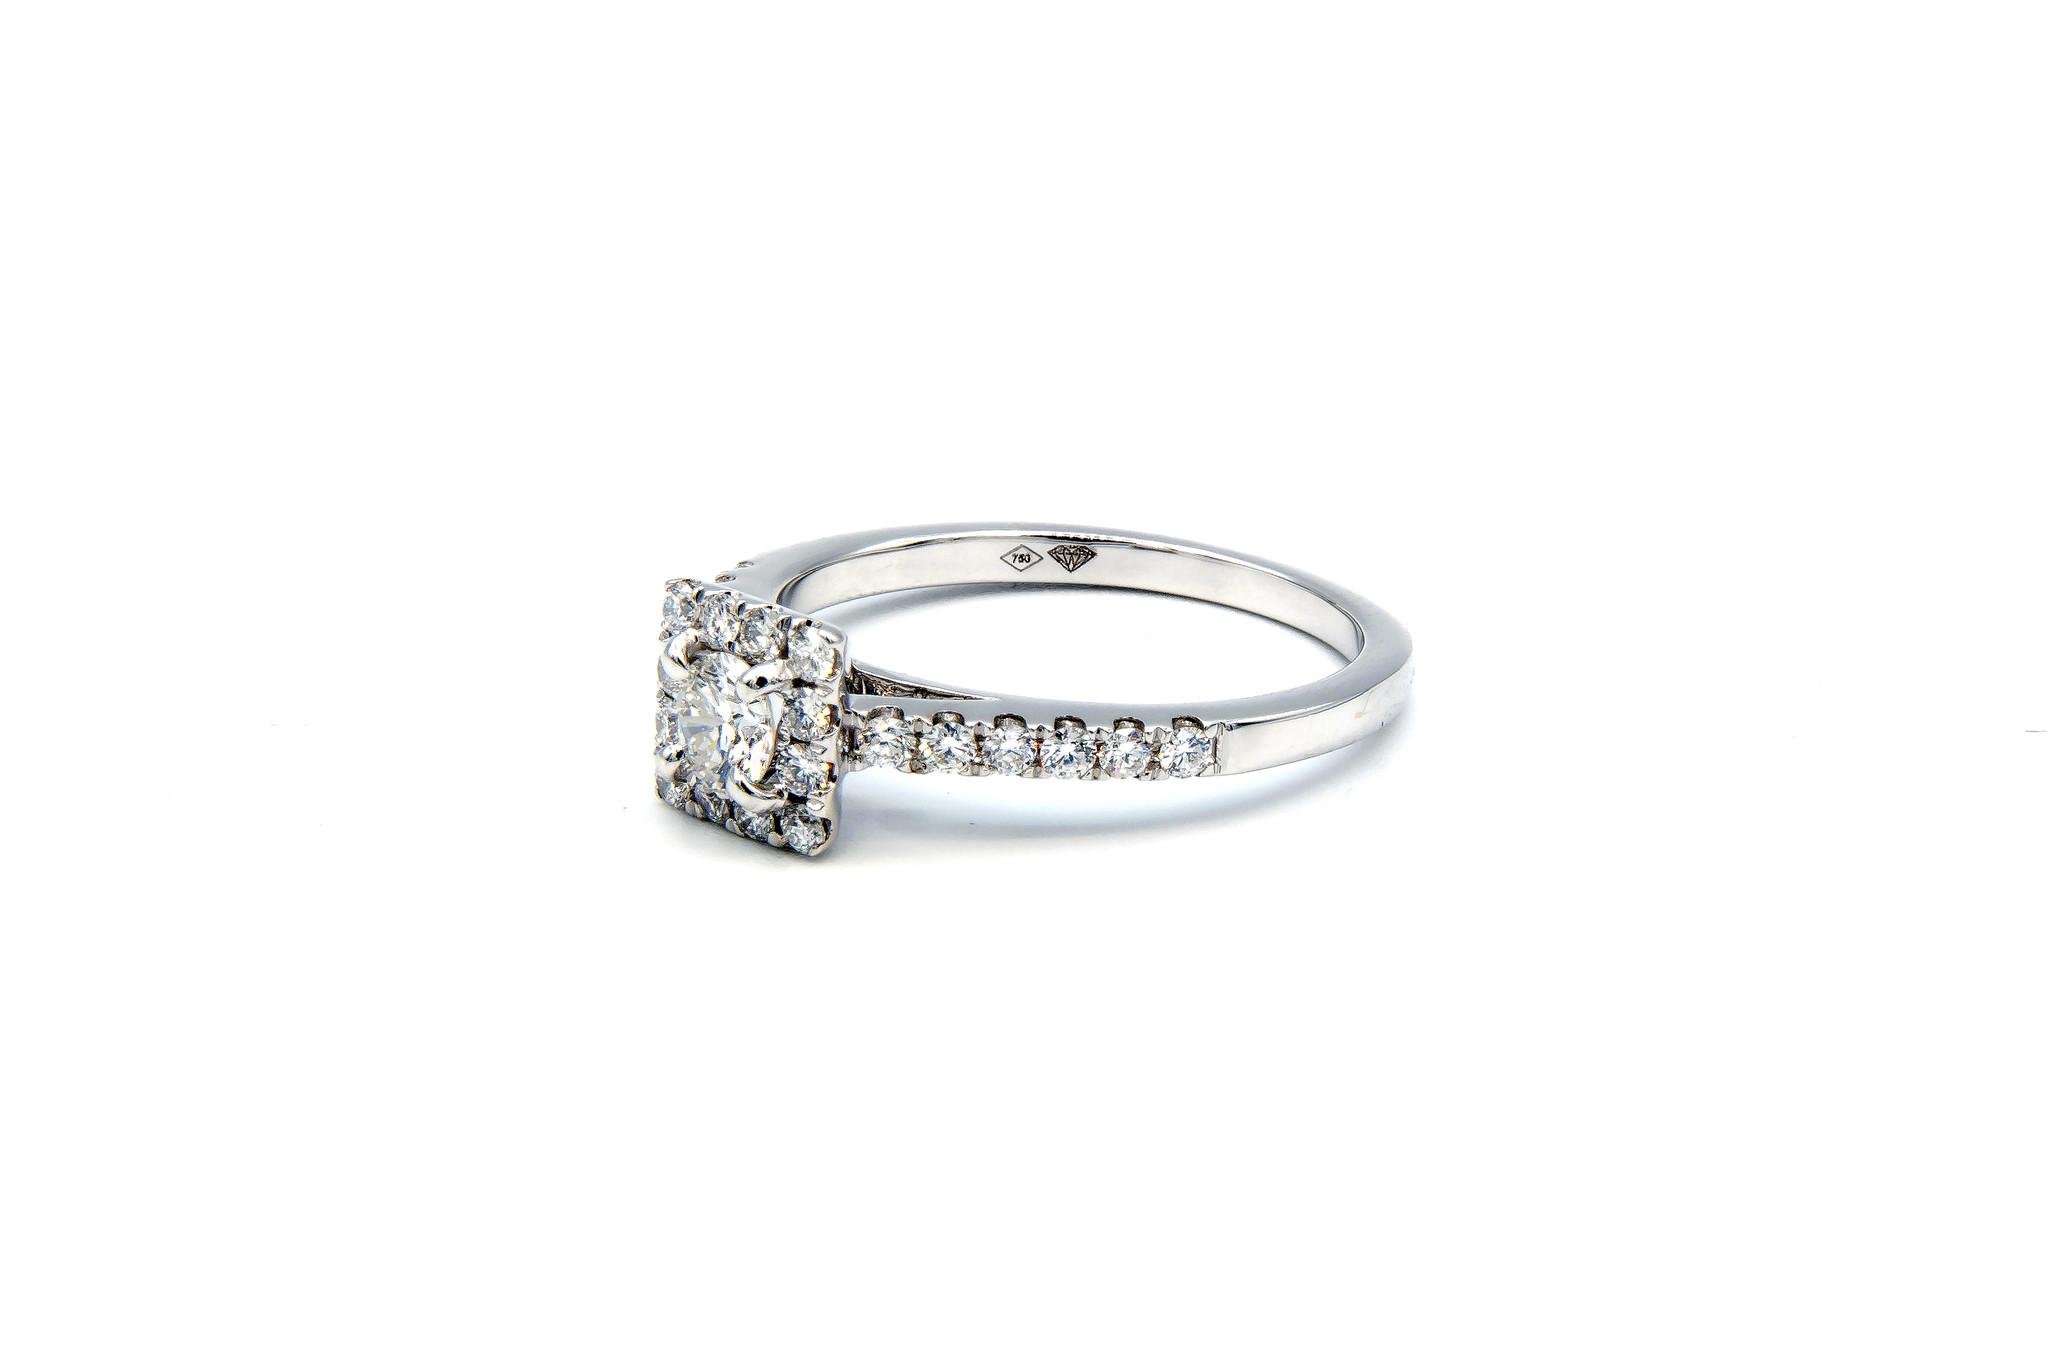 Ring verlovingsring witgoud met 0,2 ct SI en 0,28 ct VS diamant-3